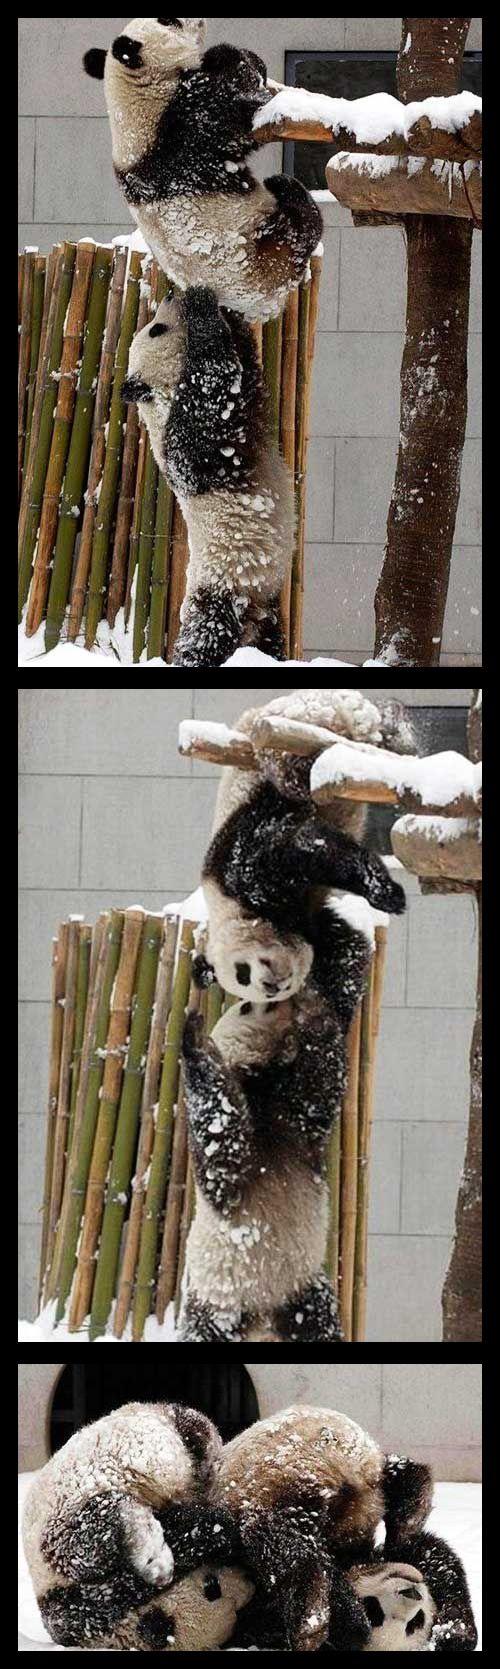 panda acrobats!